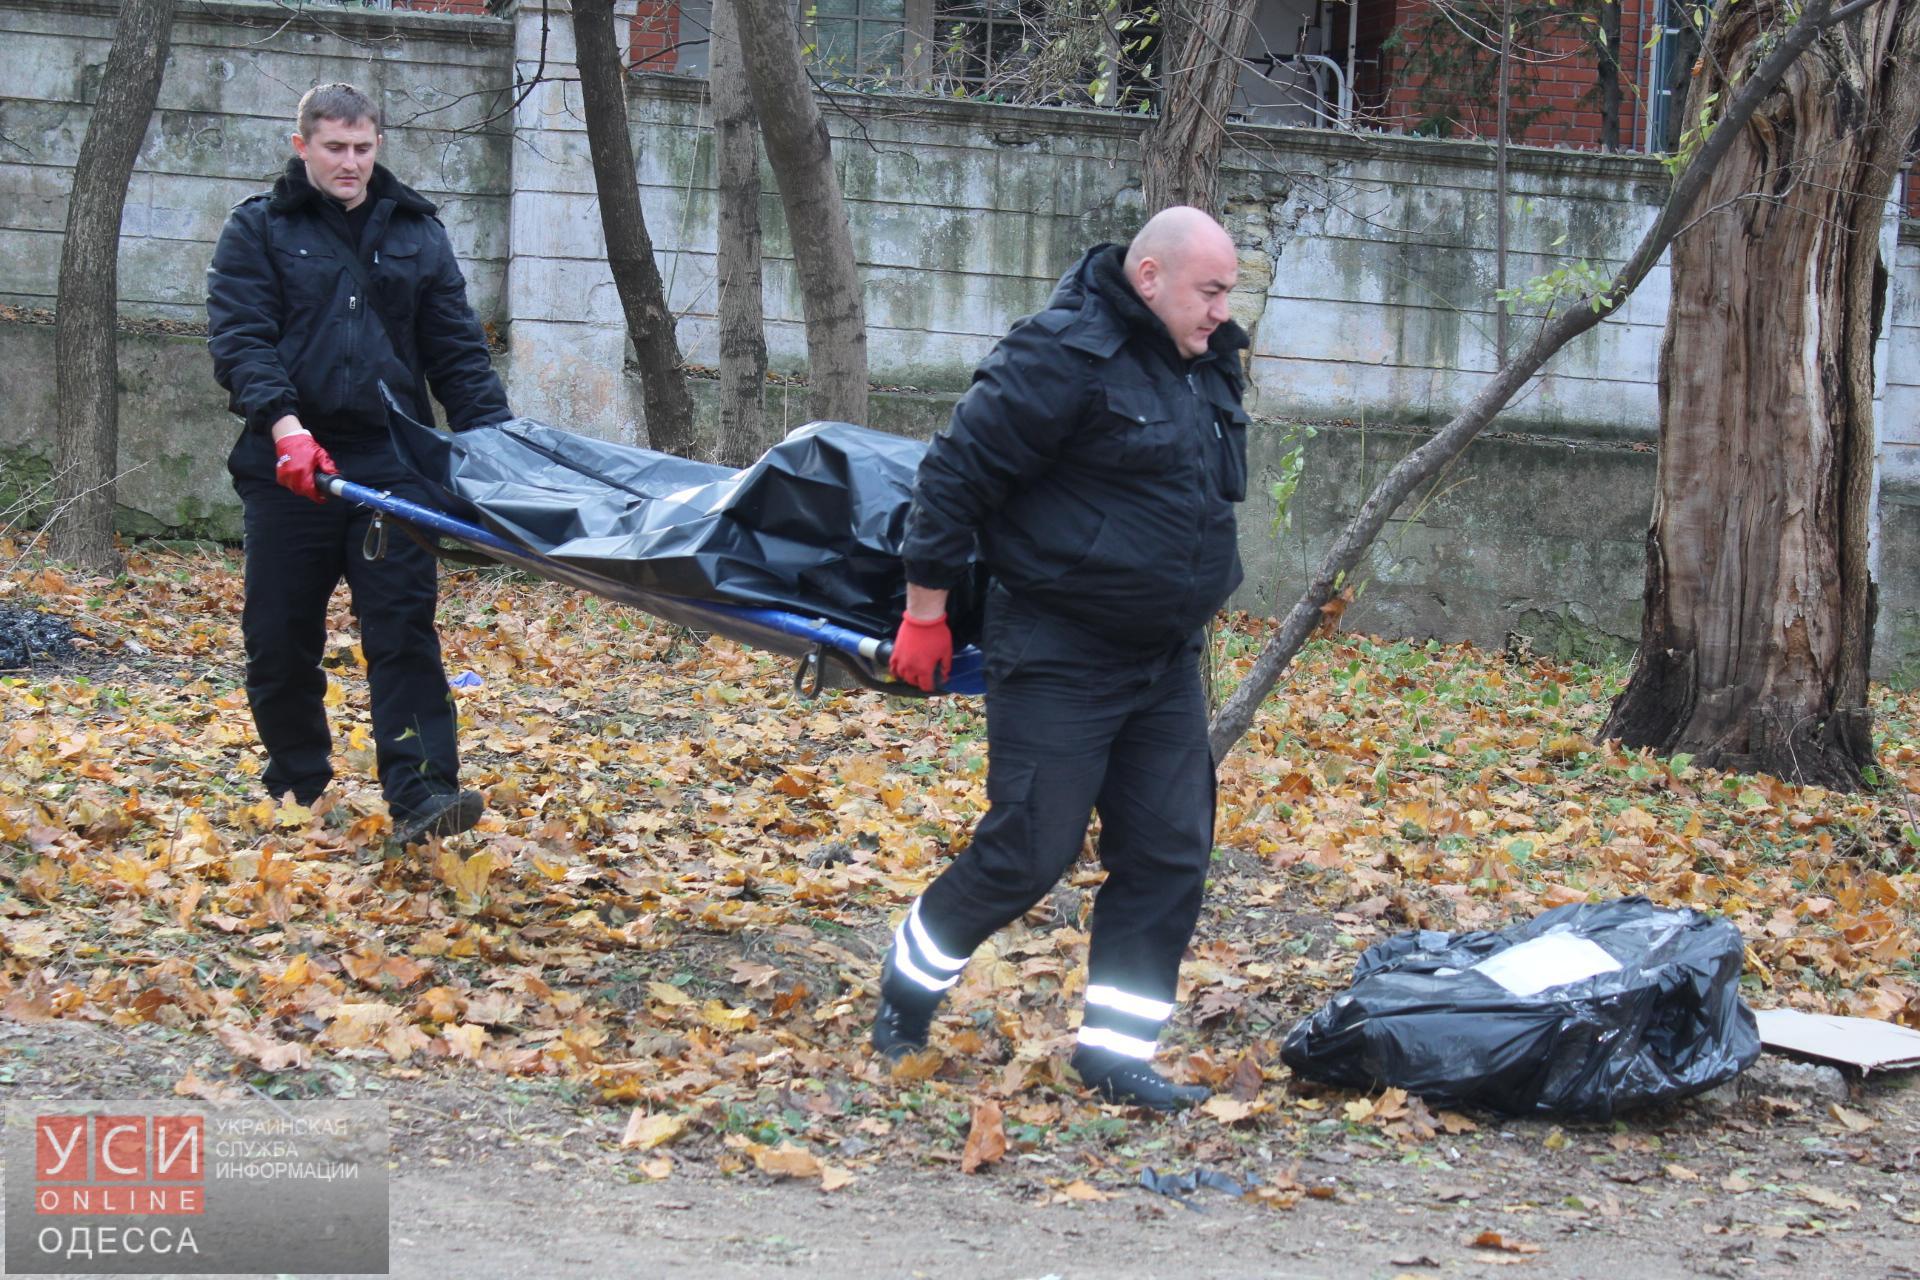 ВОдессе найден обгоревший труп винвалидной коляске